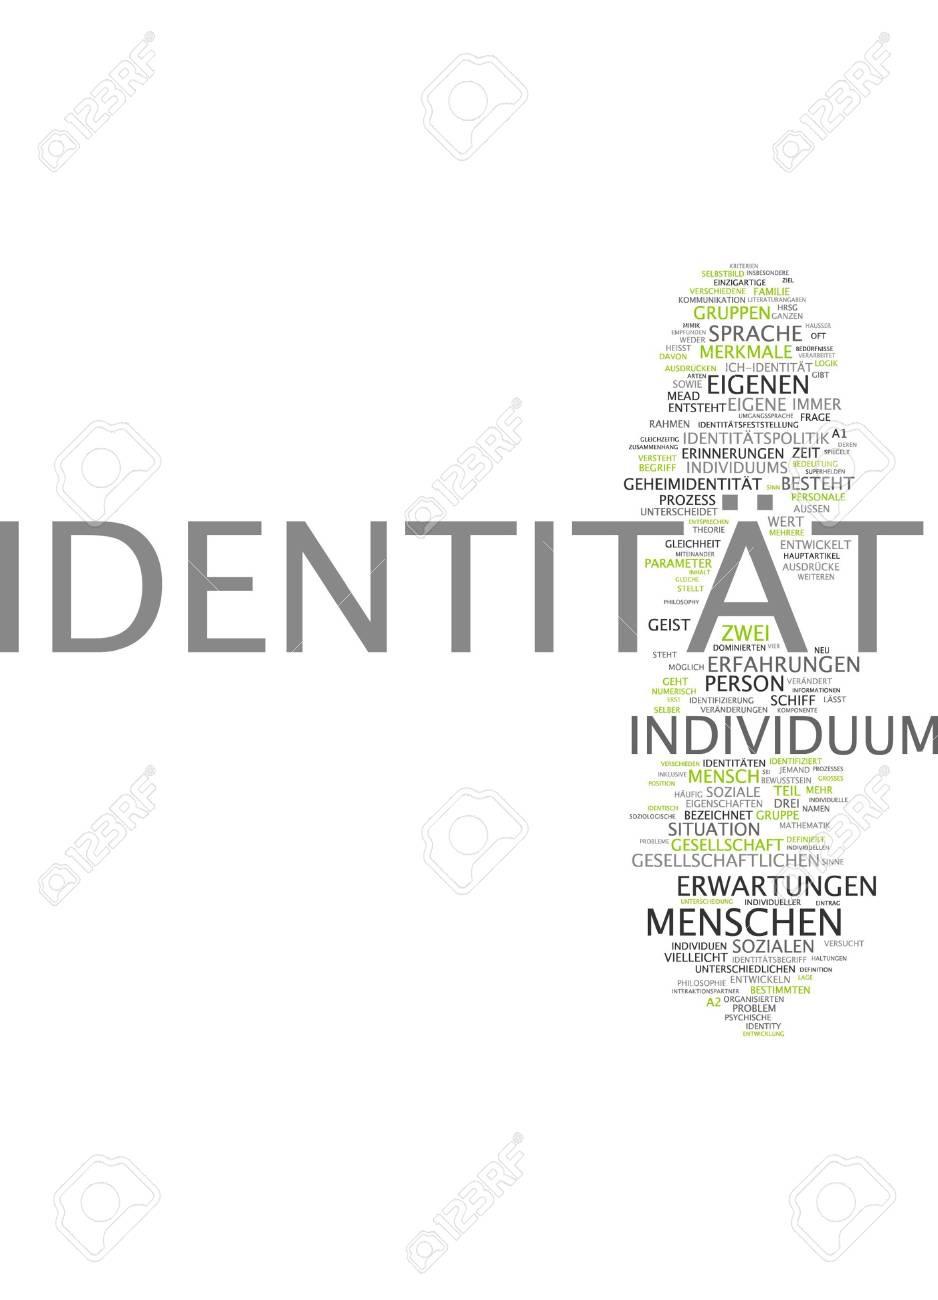 Notate 31 –Identität